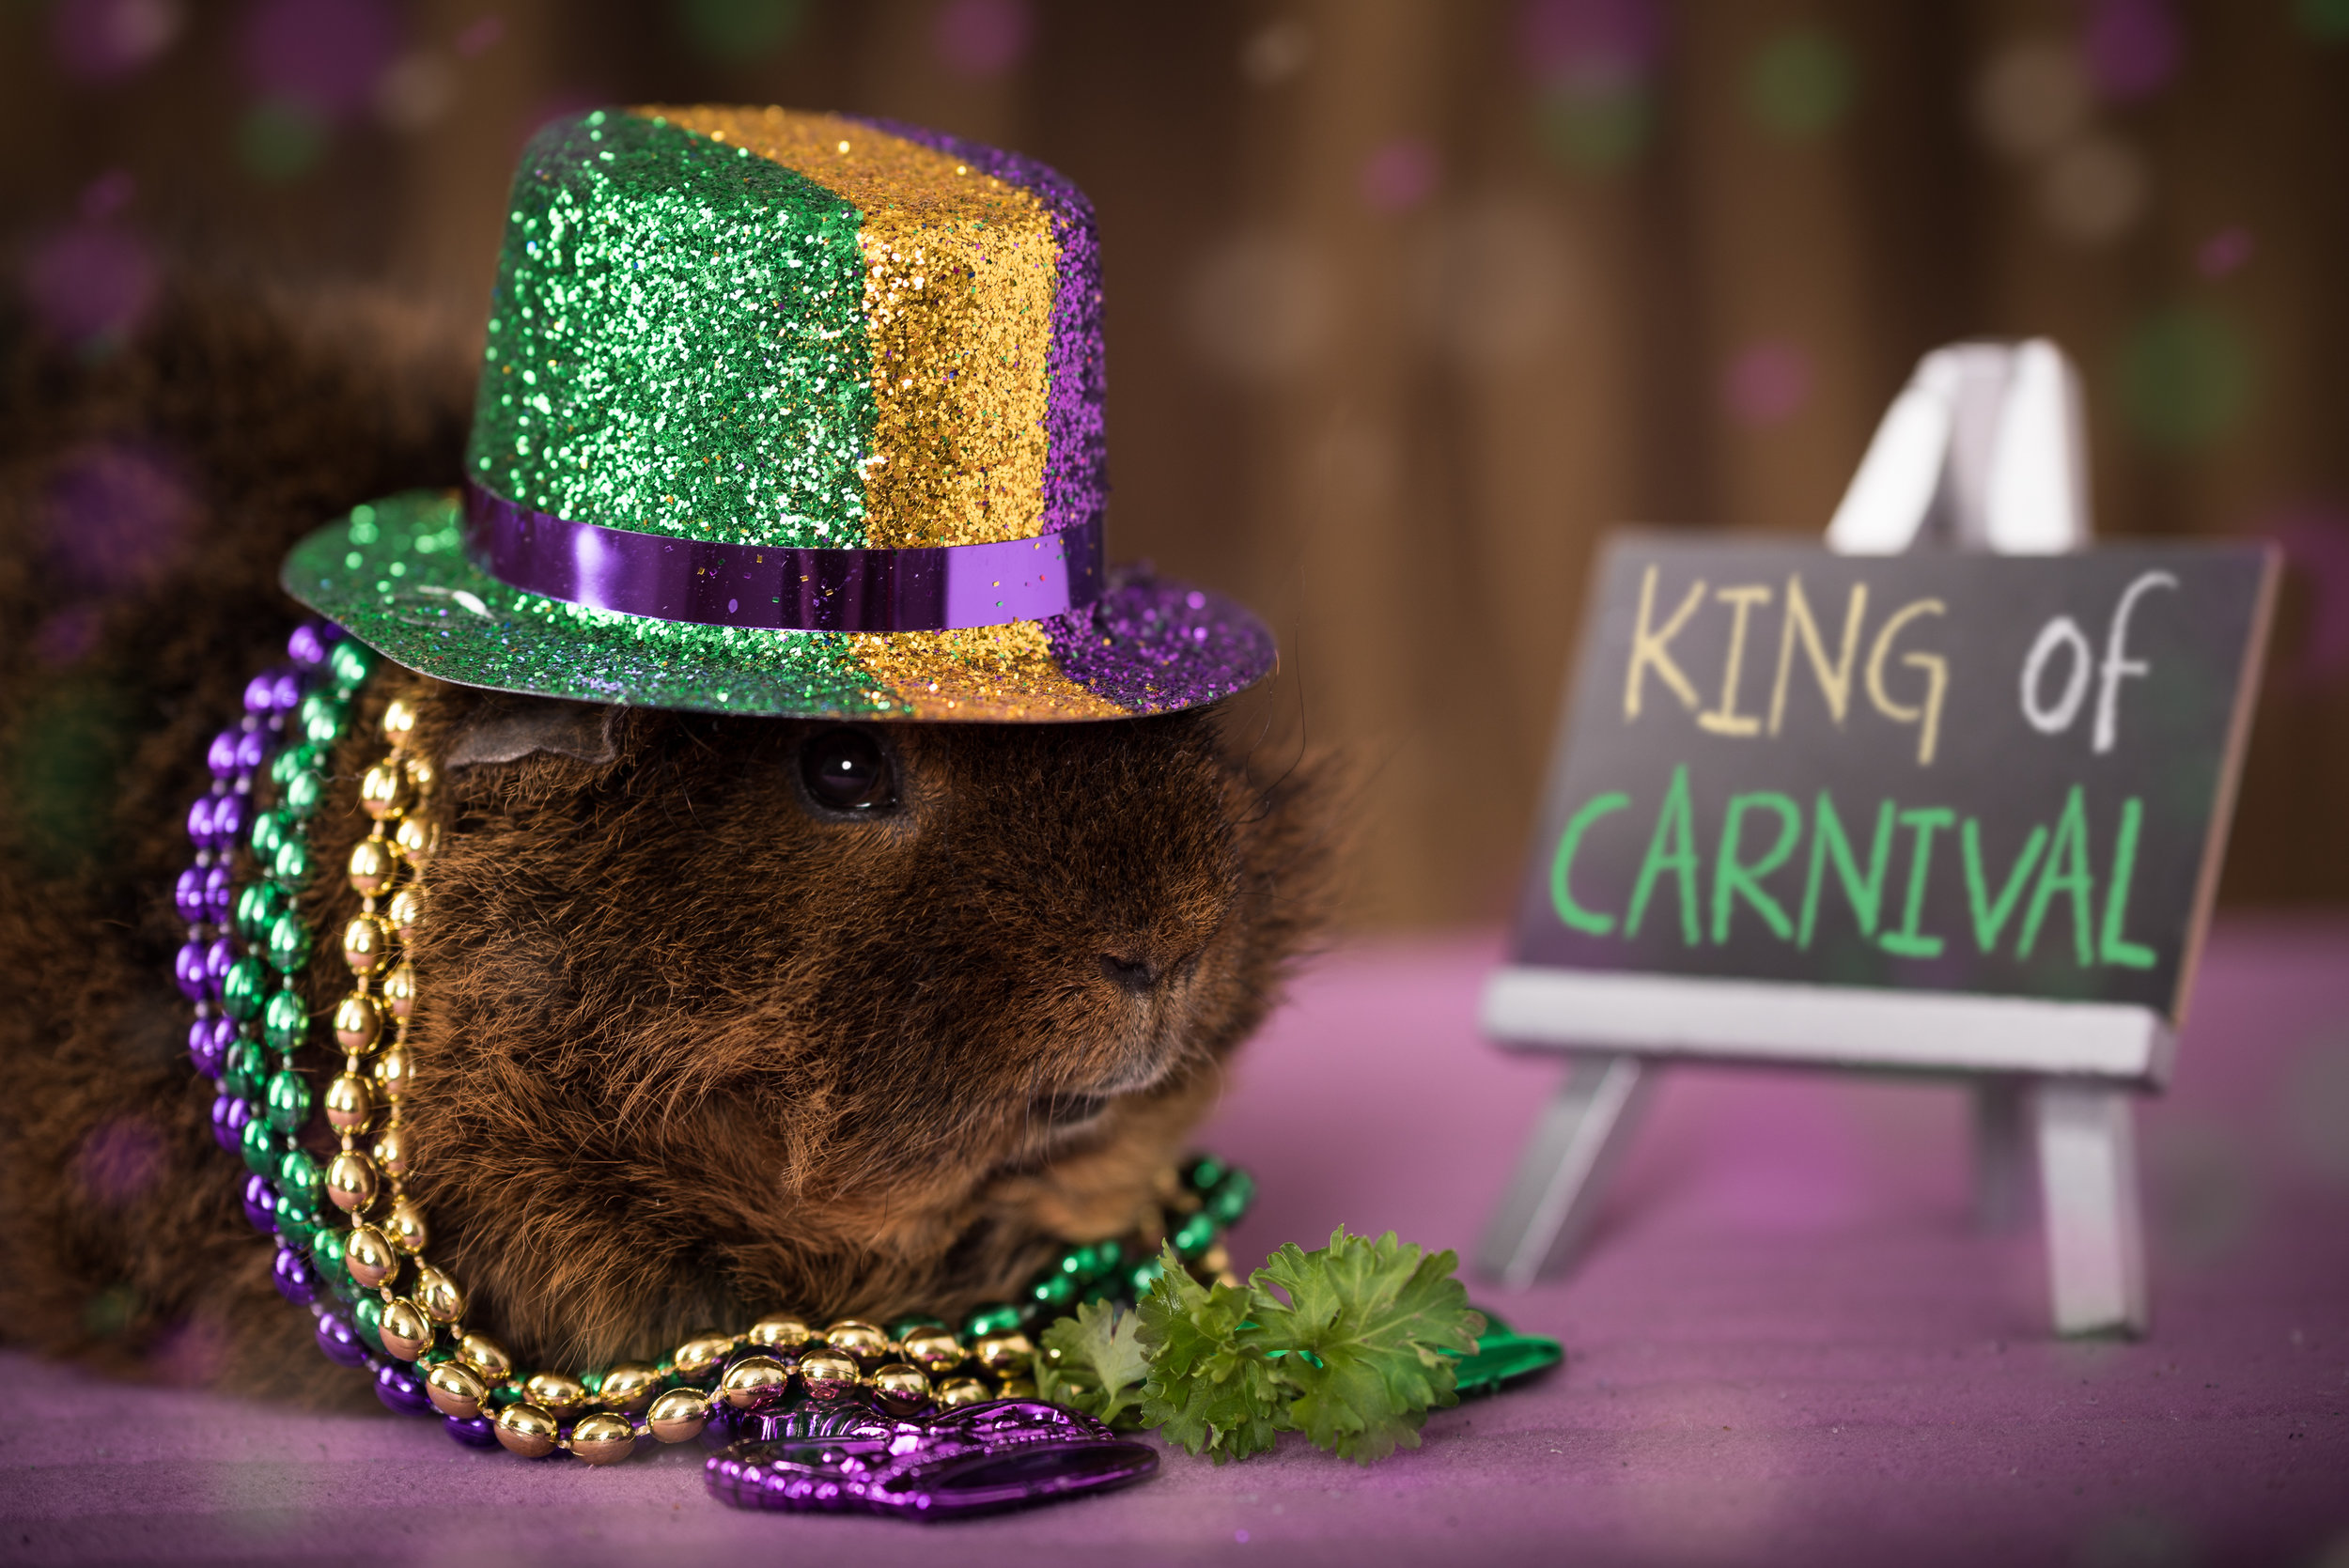 Wilbur, the King of Carnival